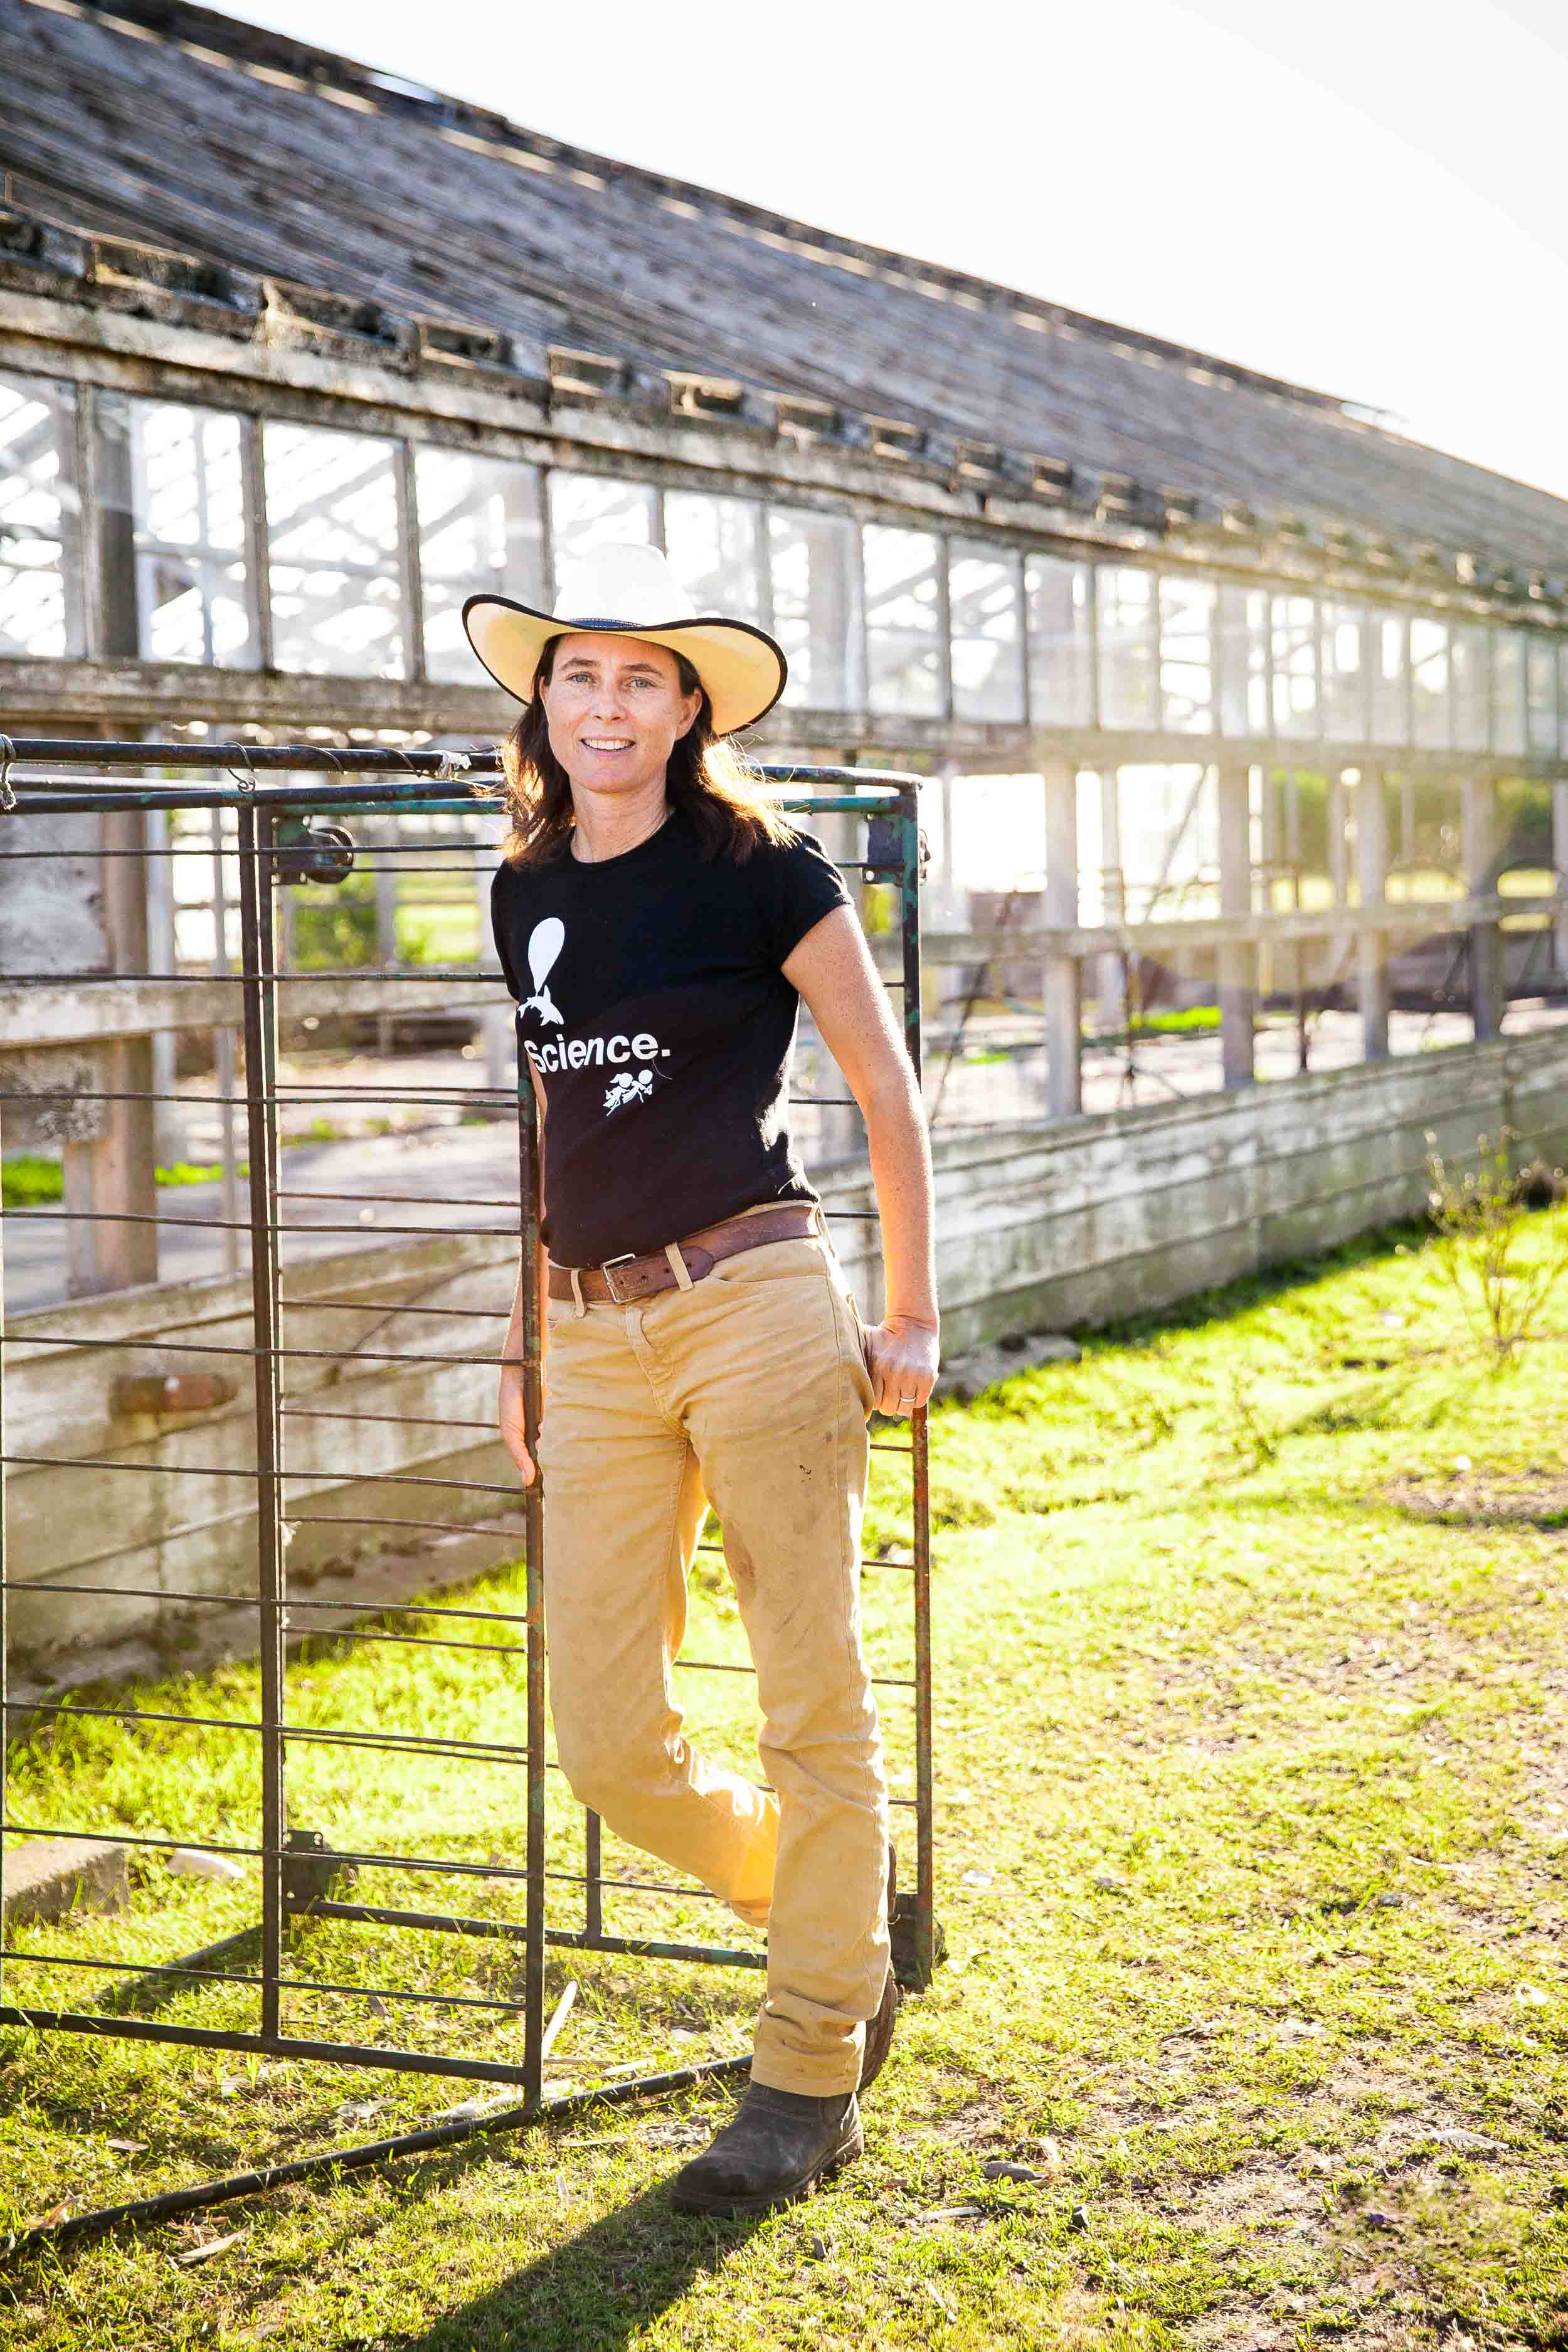 Images of Sunnyside Farm in Richmond, CA. Shot for Edible Marin.